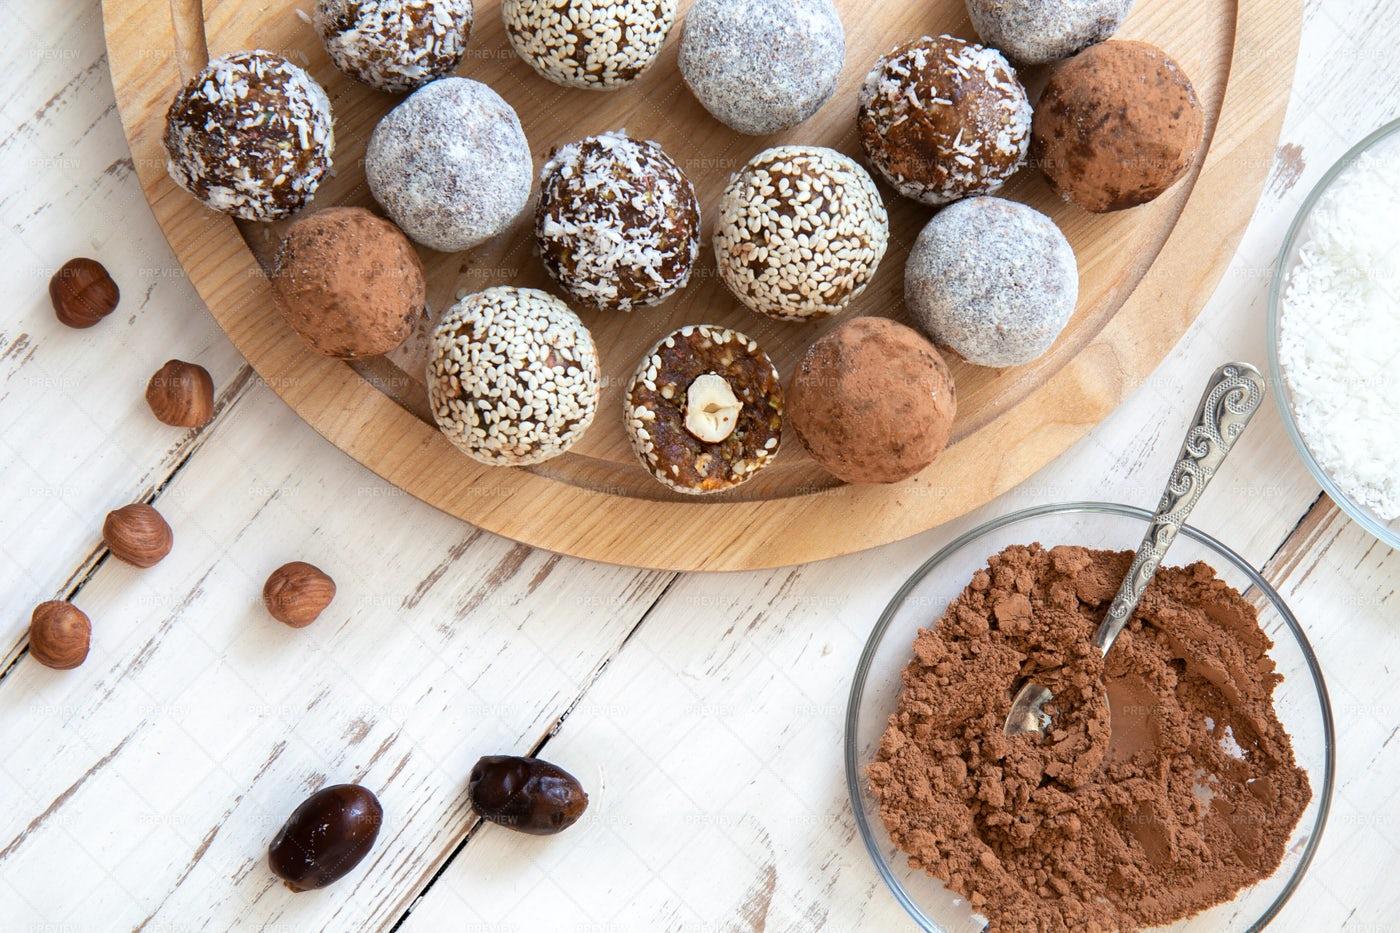 Preparing Snack Balls: Stock Photos